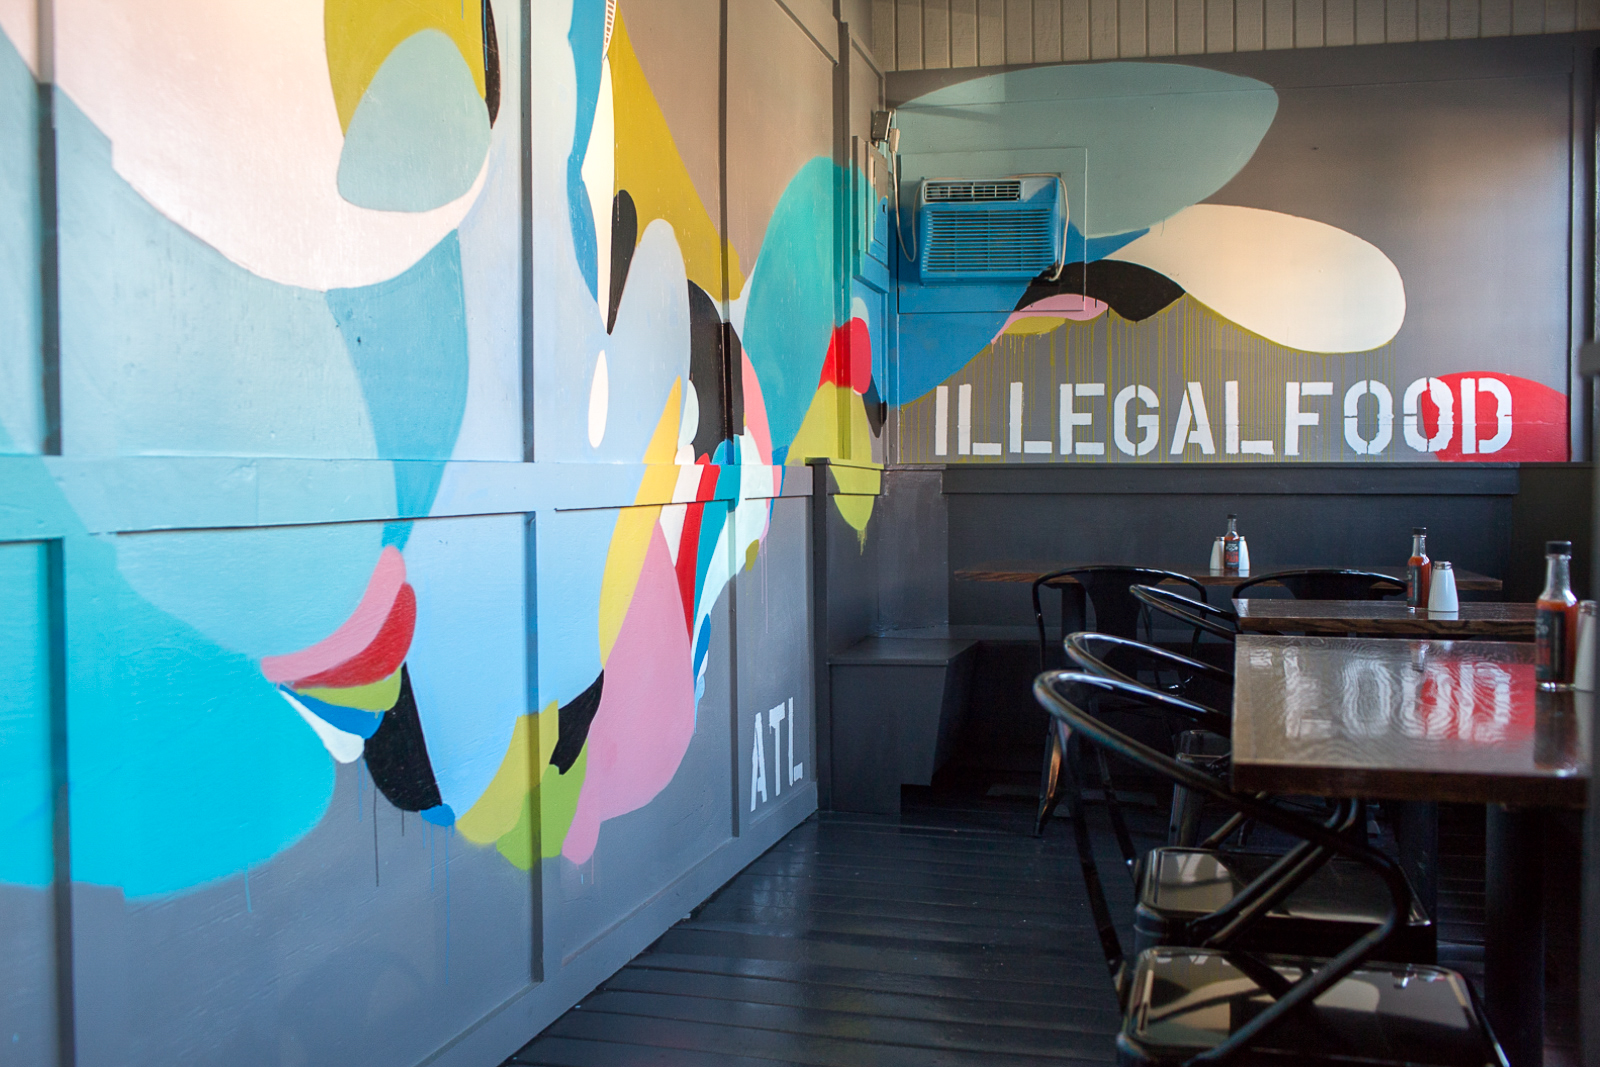 Inside Illegal Food.